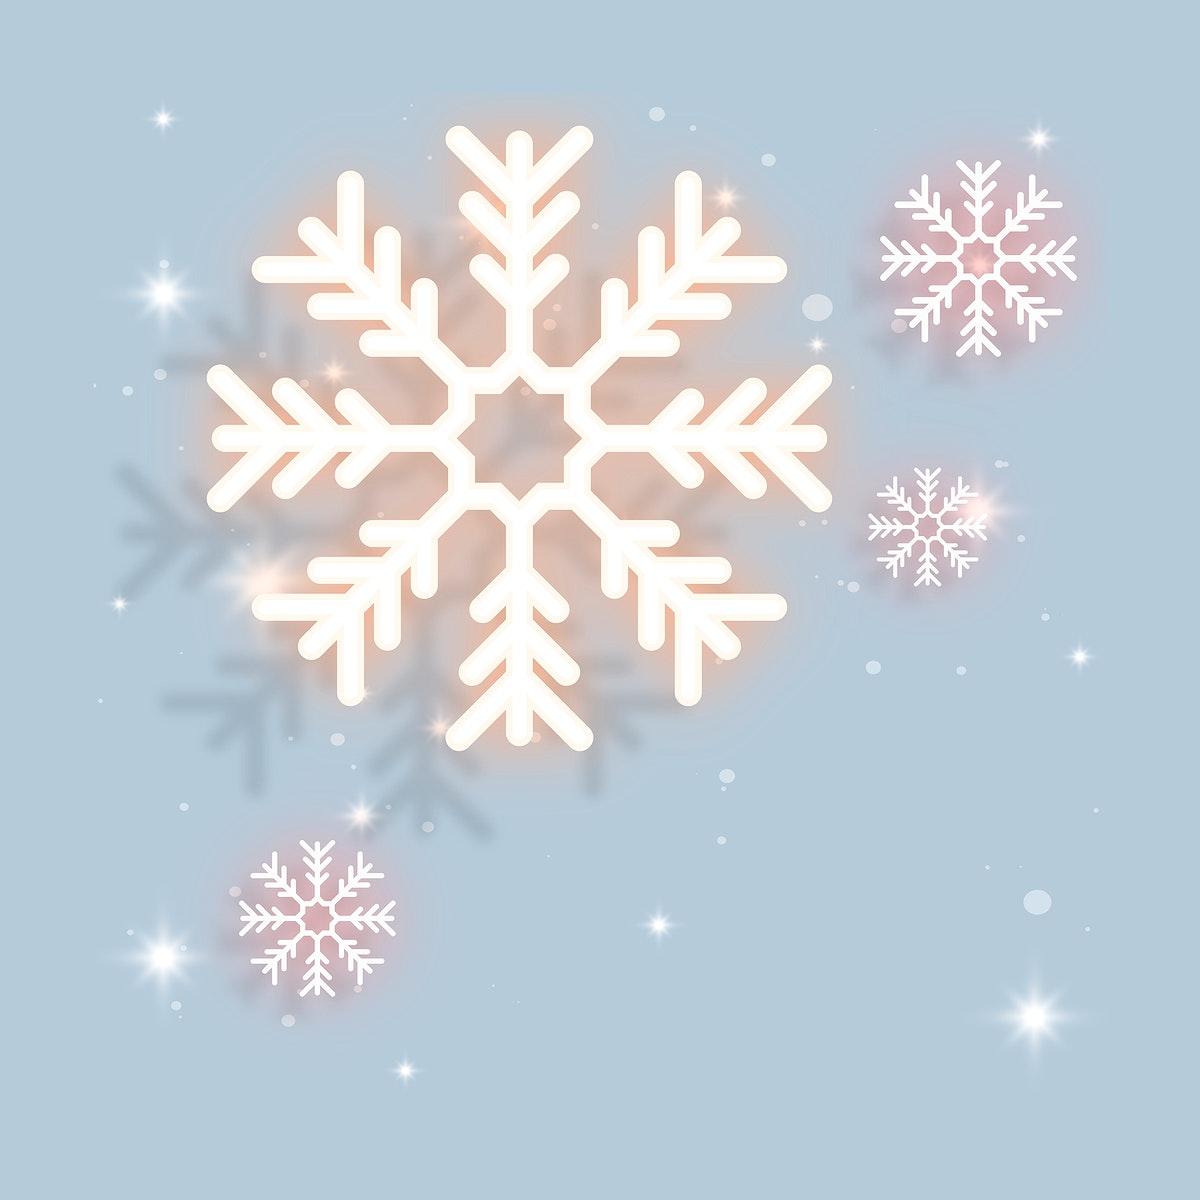 Orange neon snowflakes illustration